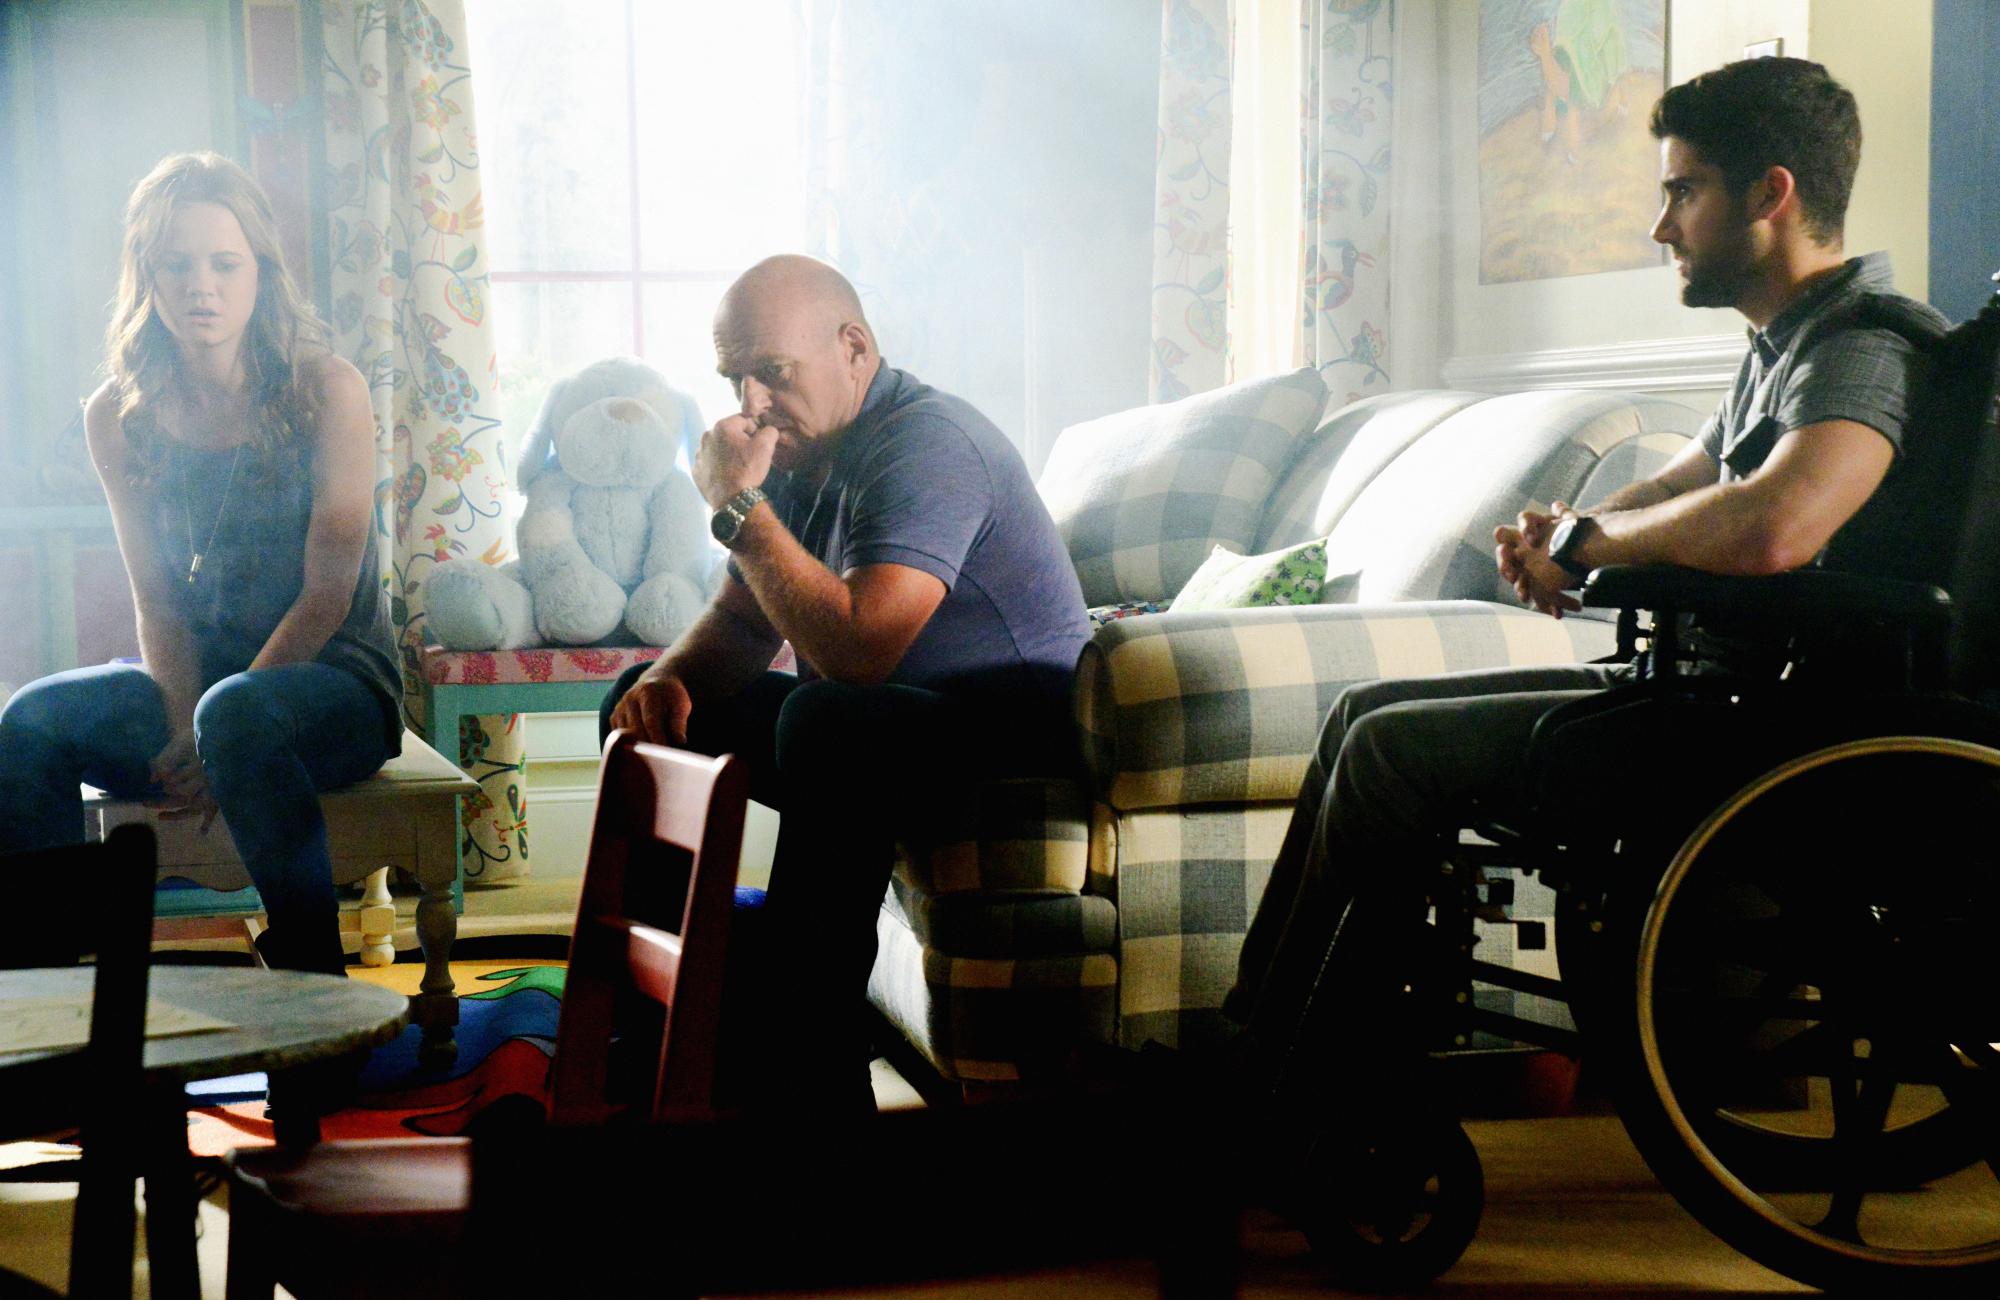 Mackenzie Lintz as Norrie Calvert-Hill, Dean Norris as James